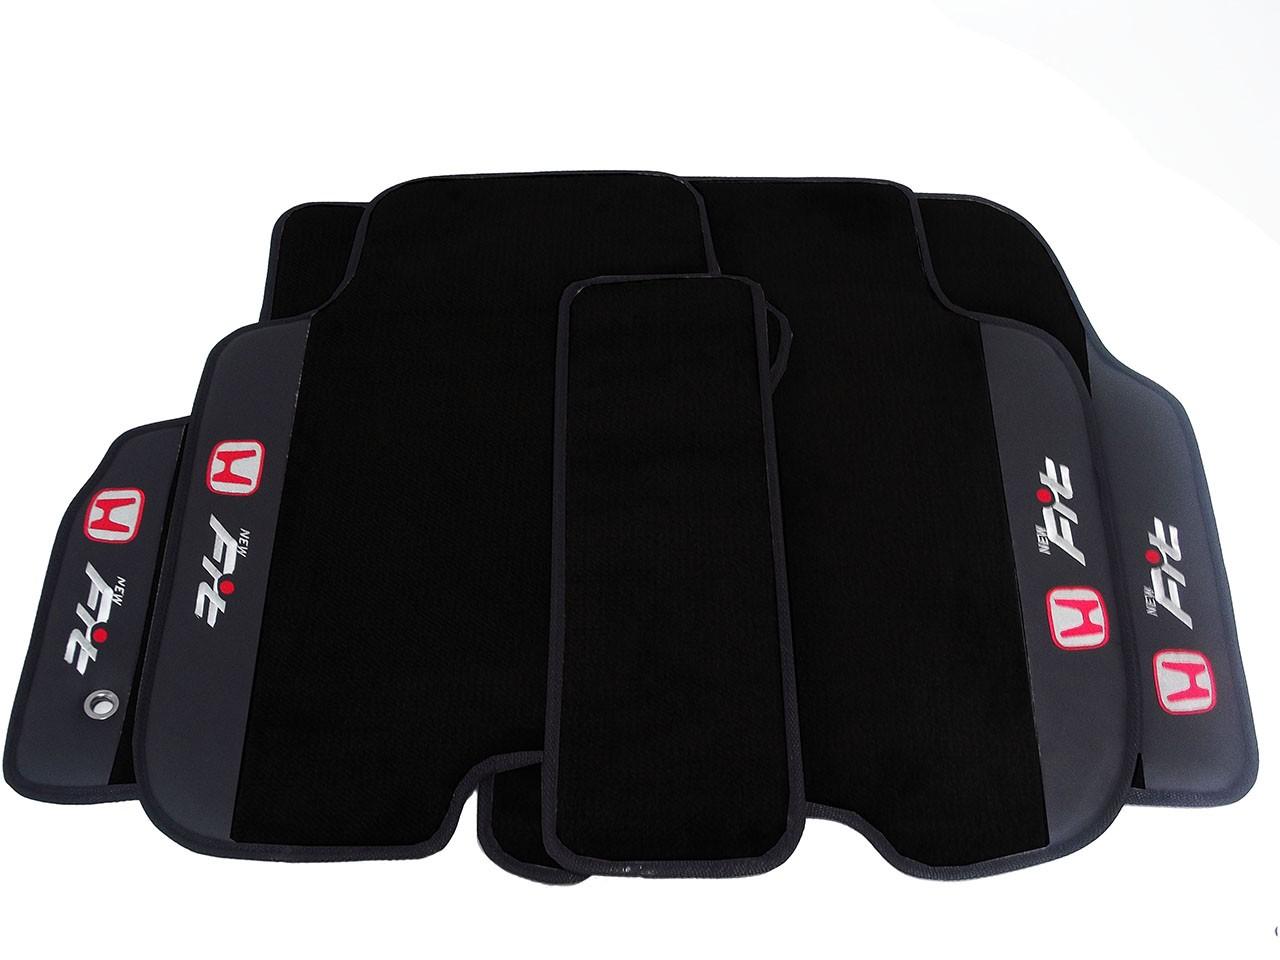 Jogo de Tapetes Honda New Fit Luxo Base Pinada